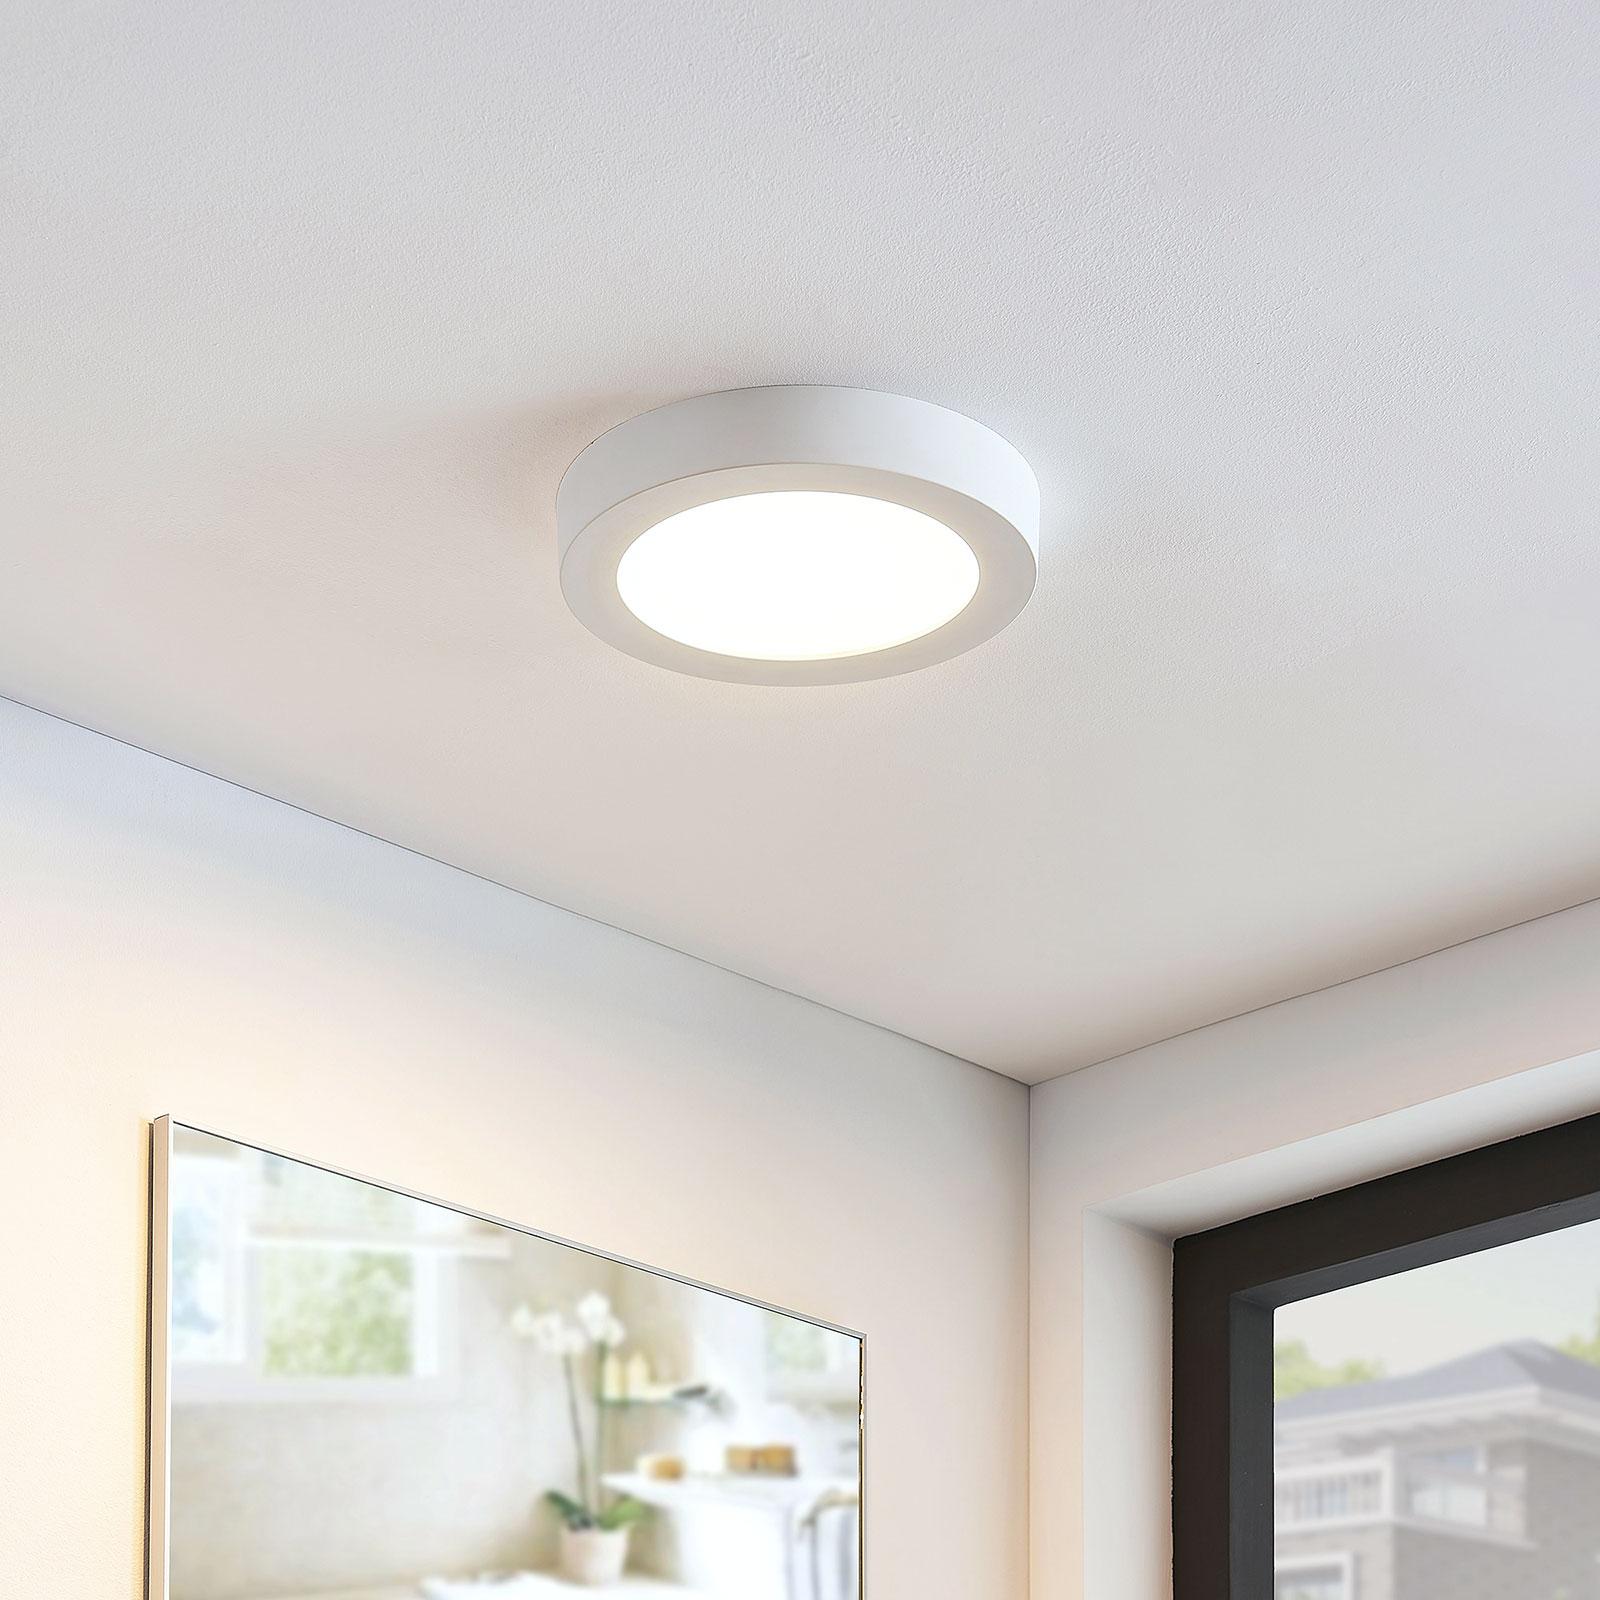 LED plafondlamp Marlo wit 3.000K rond 25,2cm